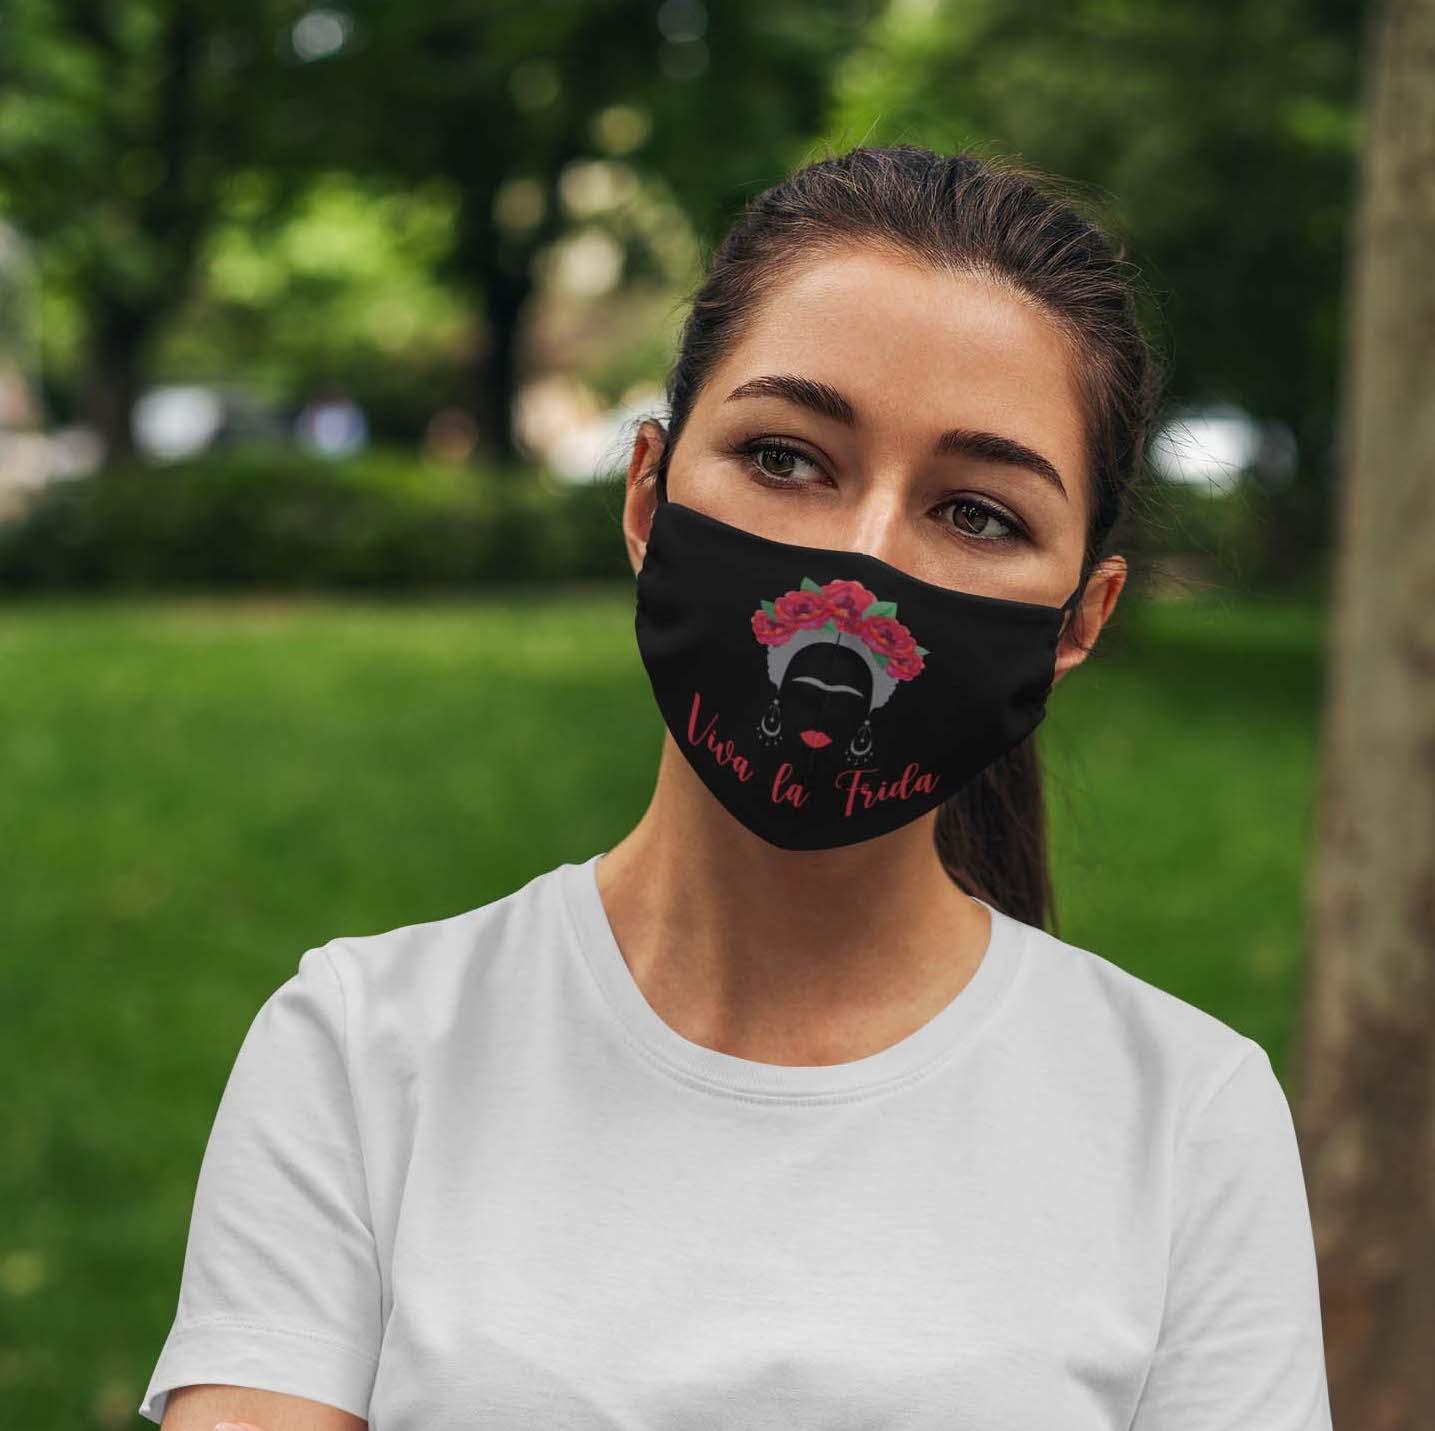 Viva la frida kahlo feminist anti pollution face mask 3